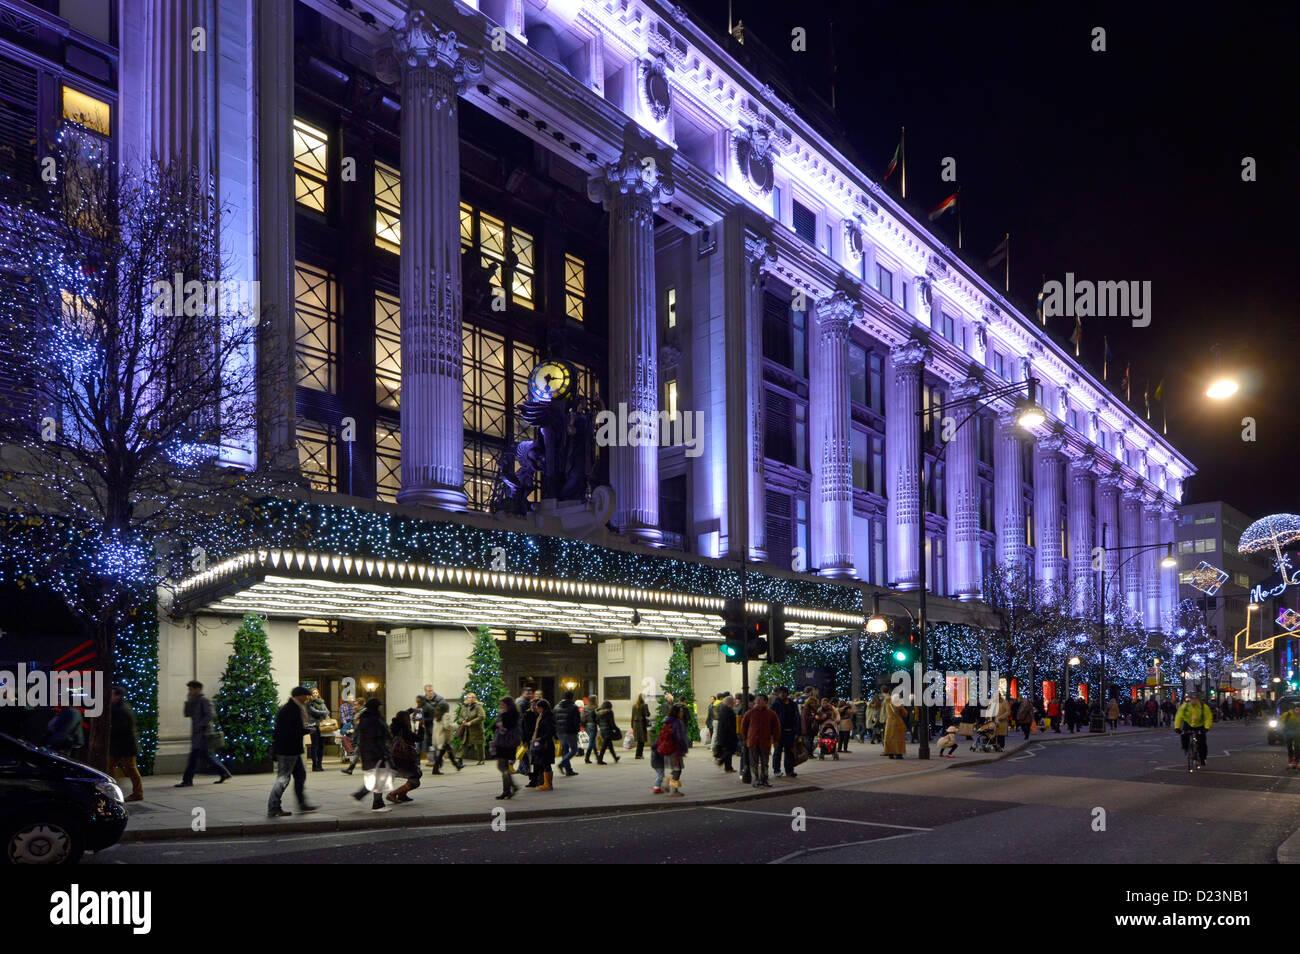 Selfridges department store christmas lights - Stock Image